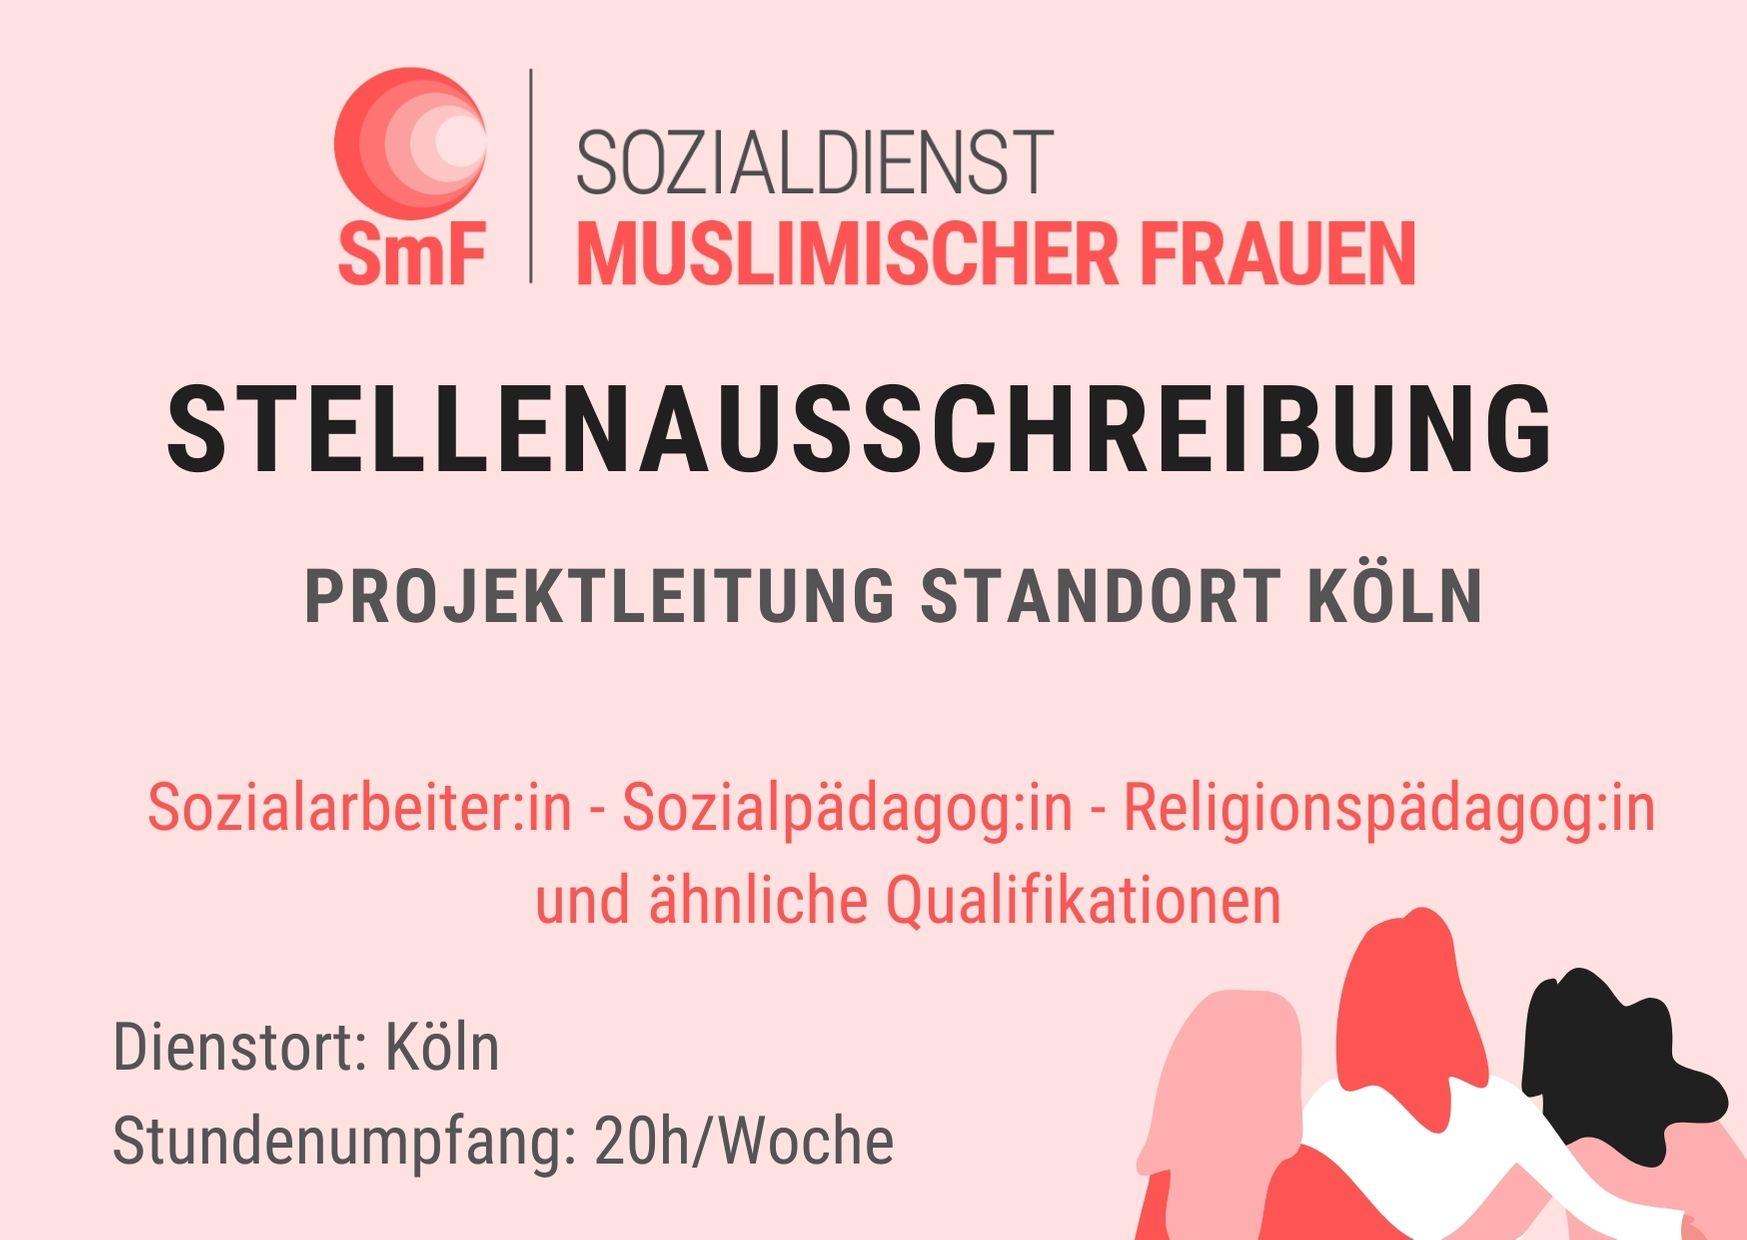 Stellenausschreibung: Projektleitung Standort Köln